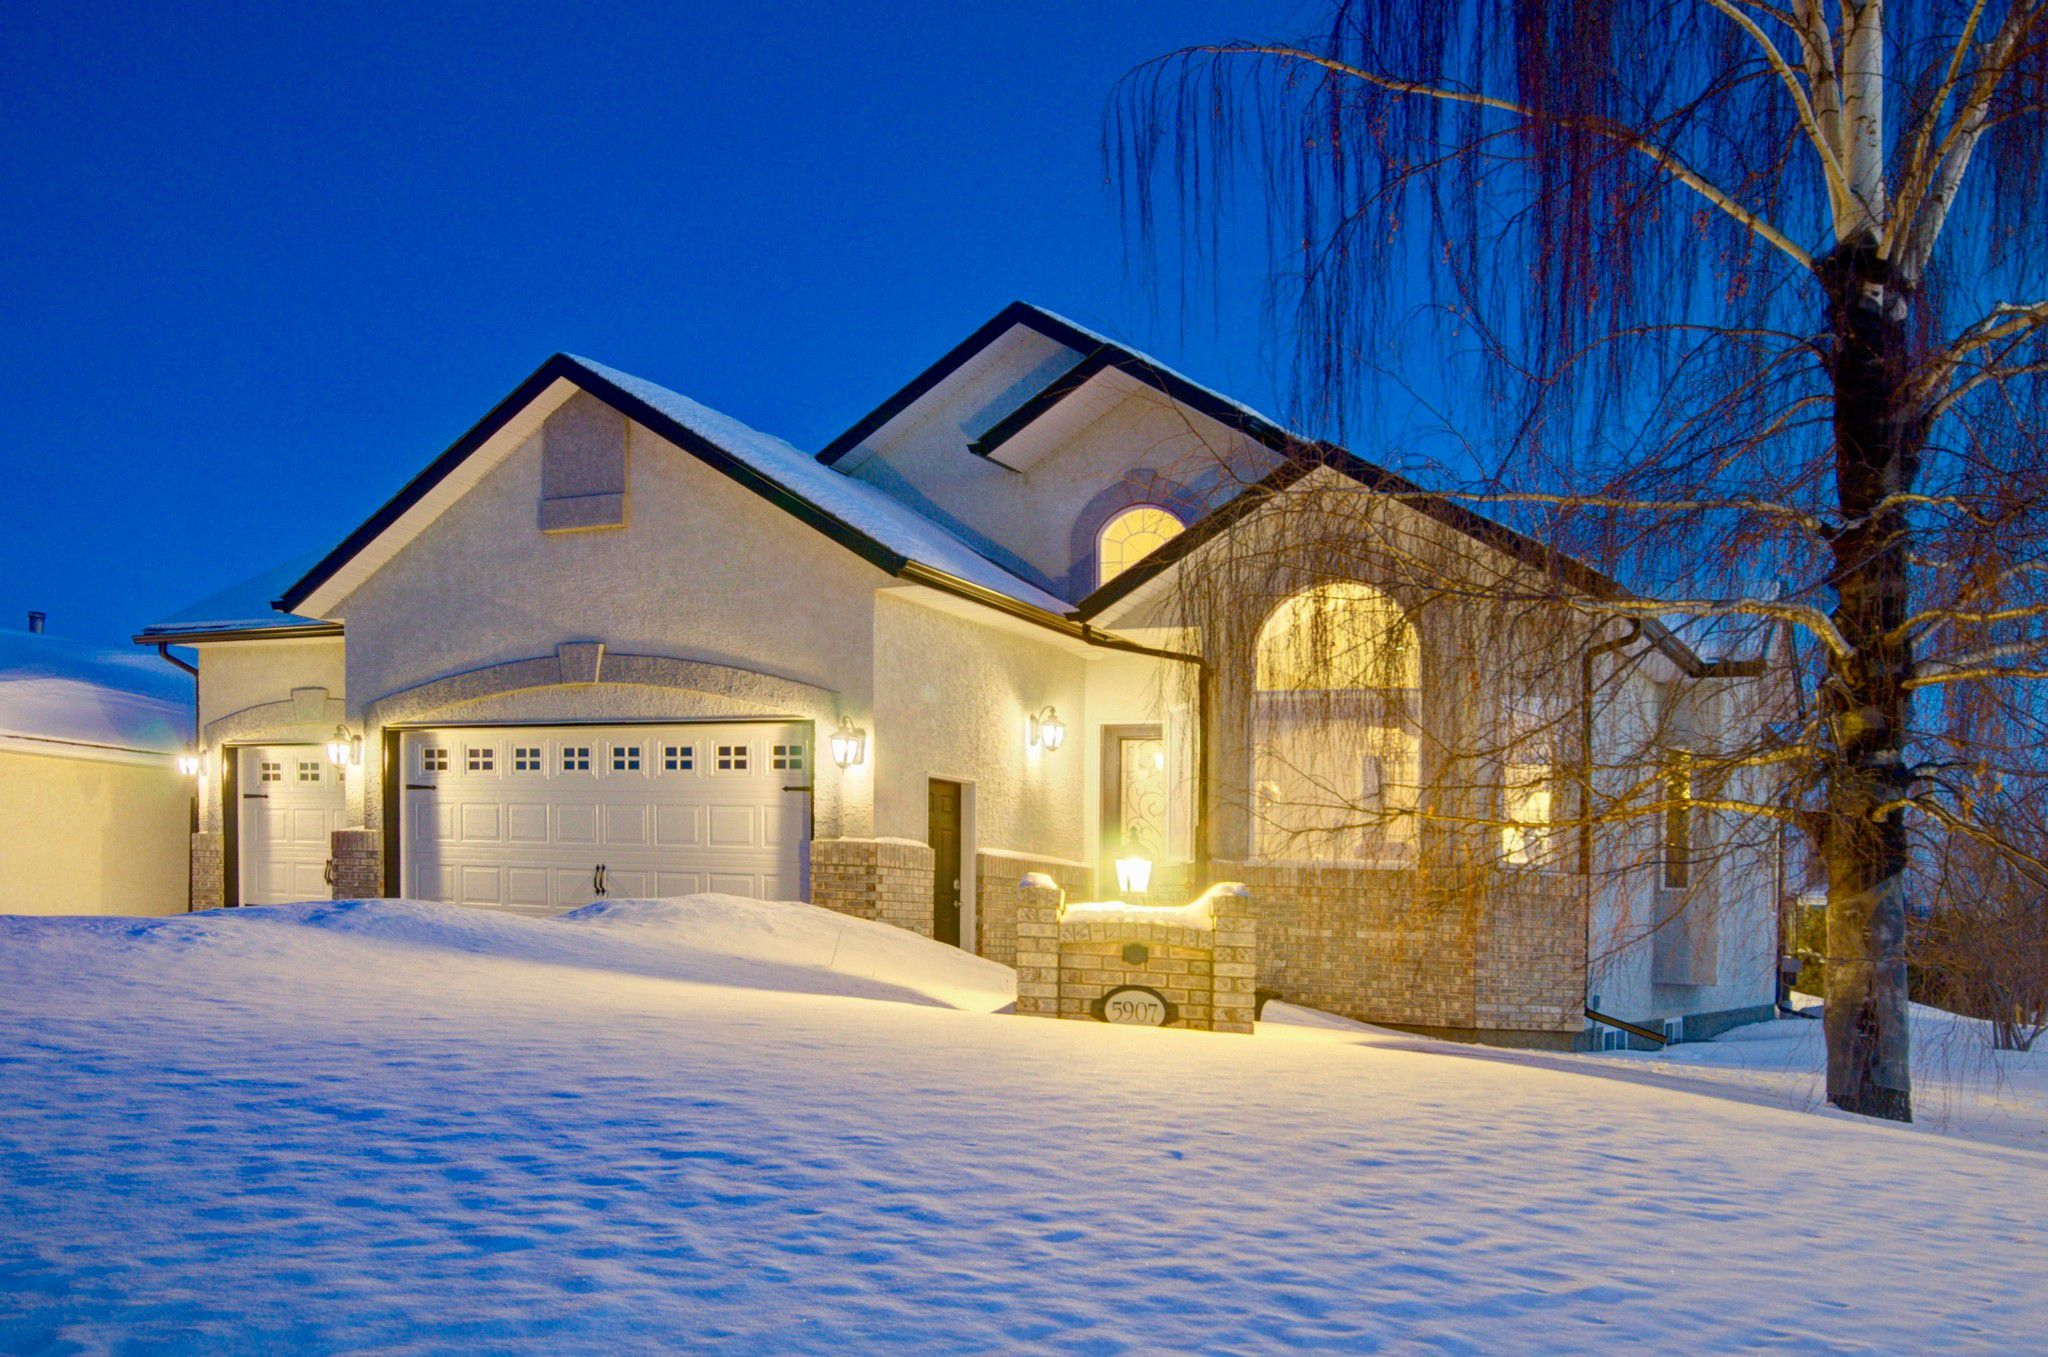 Main Photo: 5907 50 Avenue: Barrhead House for sale : MLS®# E4146109